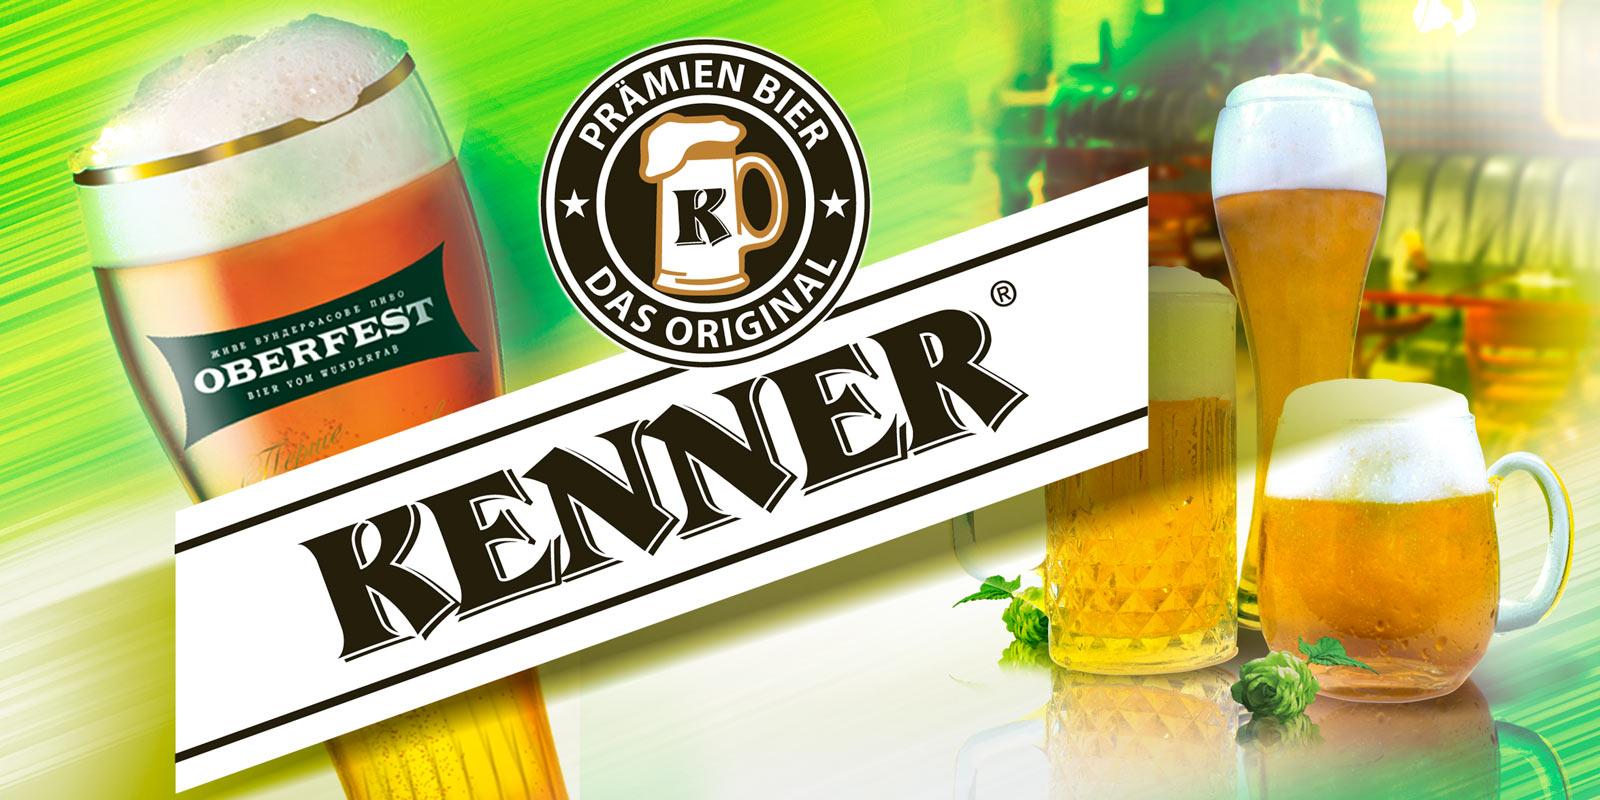 TM Kenner;;;;;;Разработка Логотипа;;;;;;<span>Клиент:</span> TM Kenner;;;;;;;;;;;;Разработка Логотипа;;;;;;1